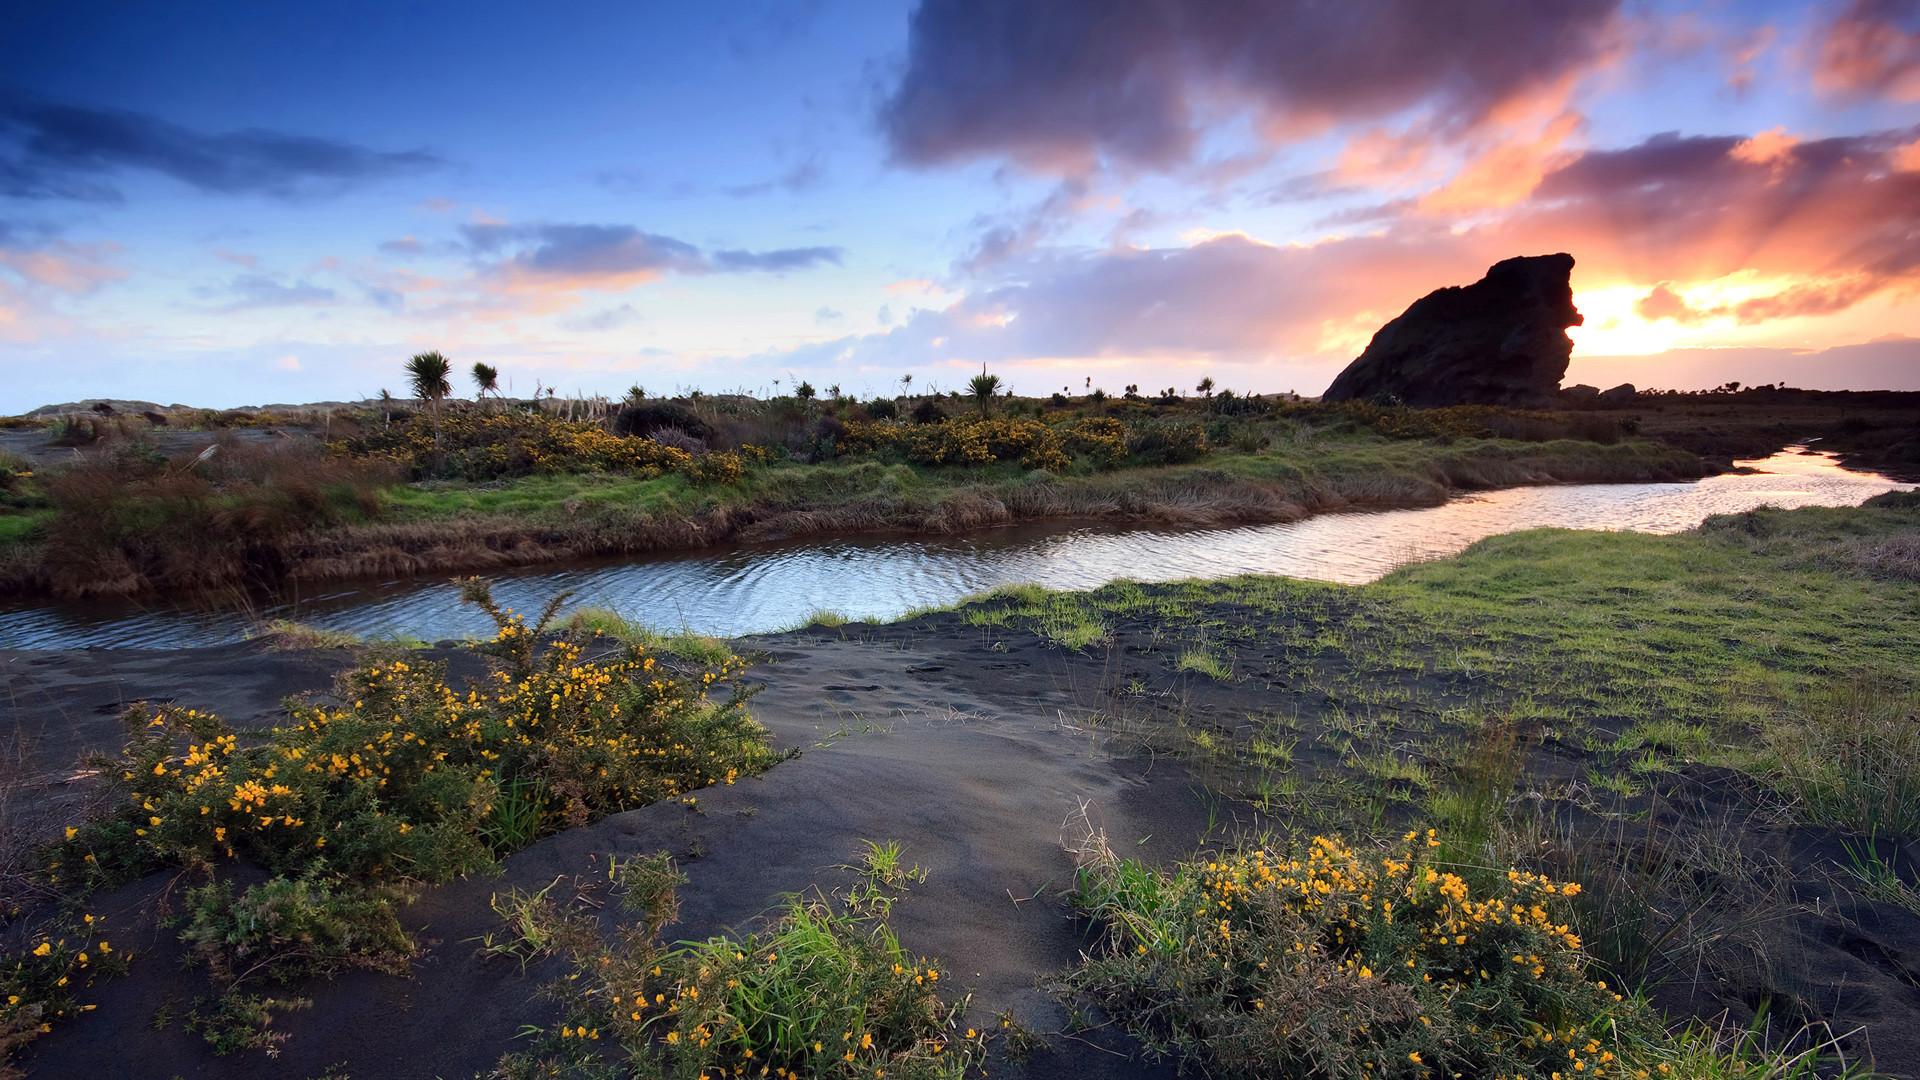 Landscape | Full HD Wallpapers, download 1080p desktop backgrounds .